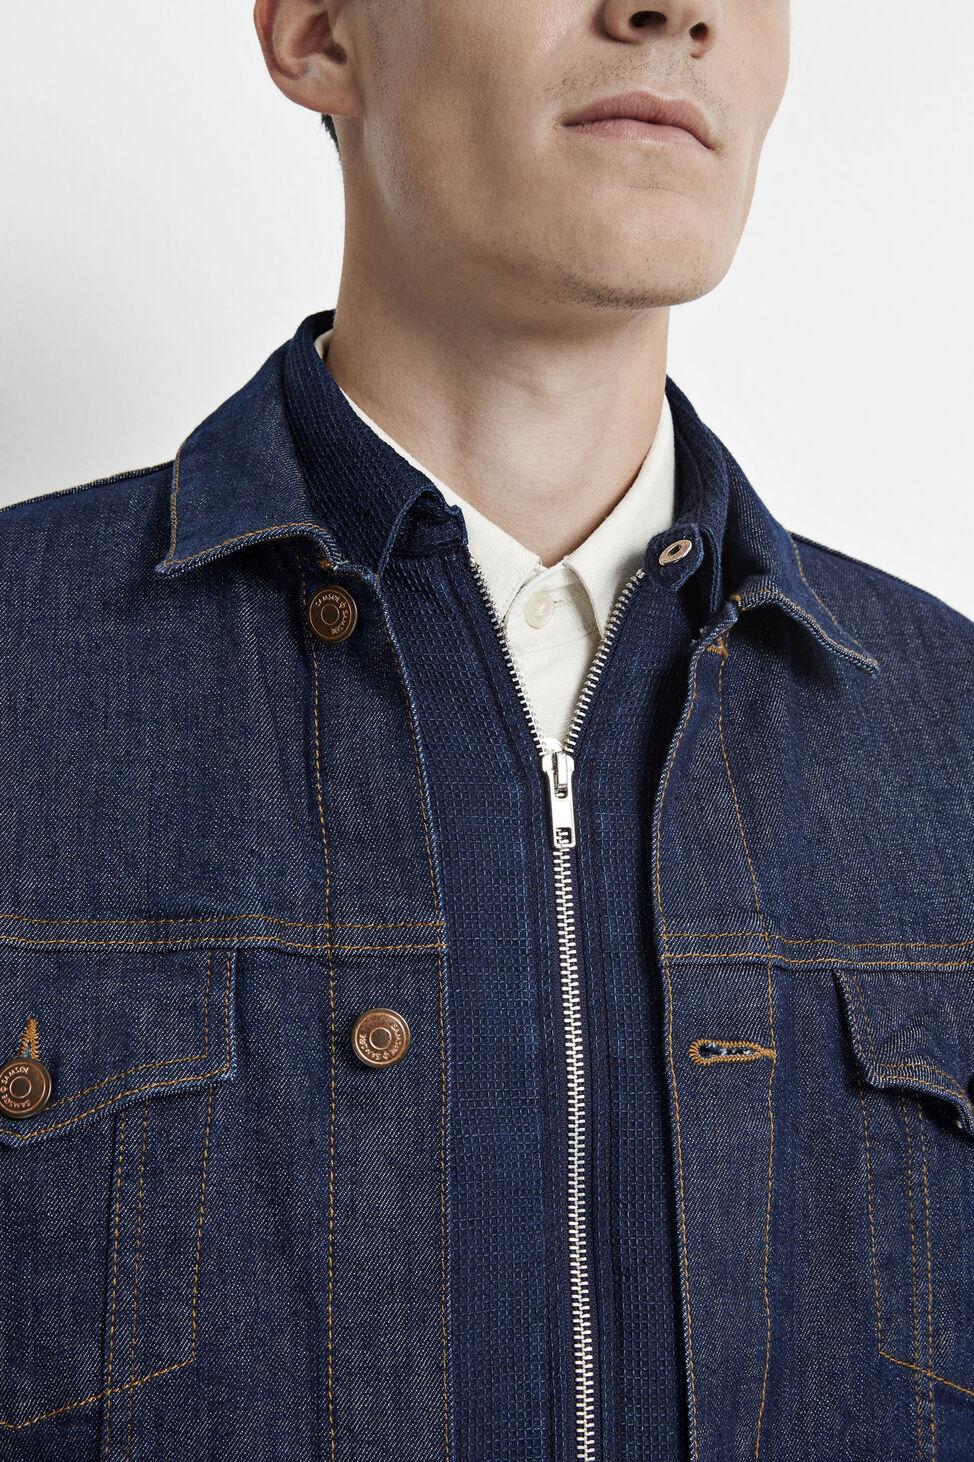 Laust jacket 7737